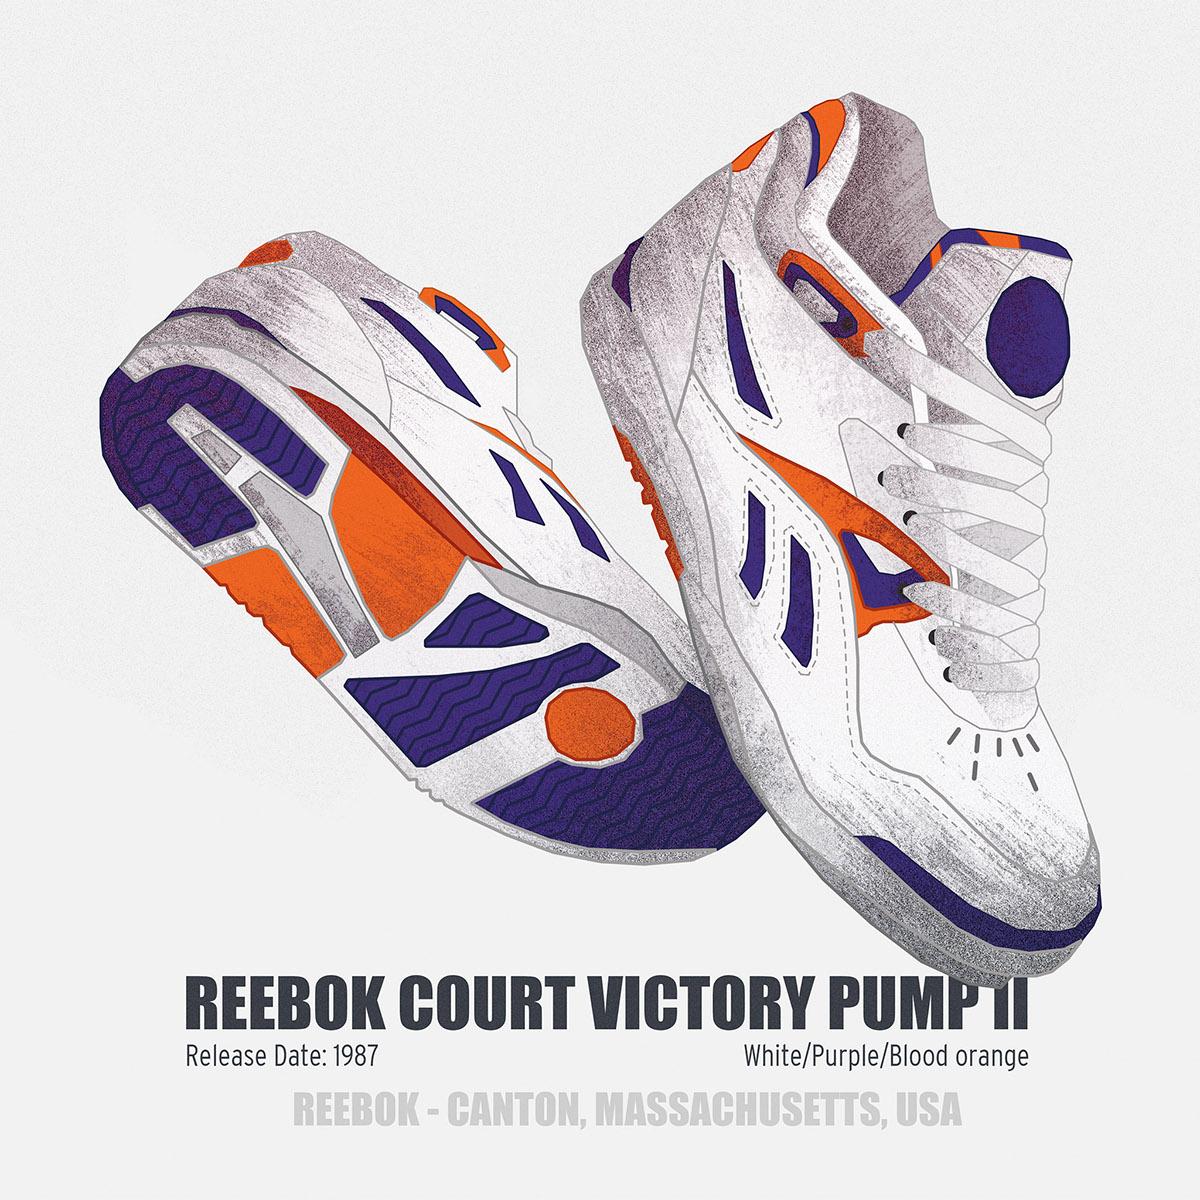 1ea3b11f265c7  010 Reebok Court Victory Pump II - http   sneakercoolture.virb.com 010- reebok-court-victory